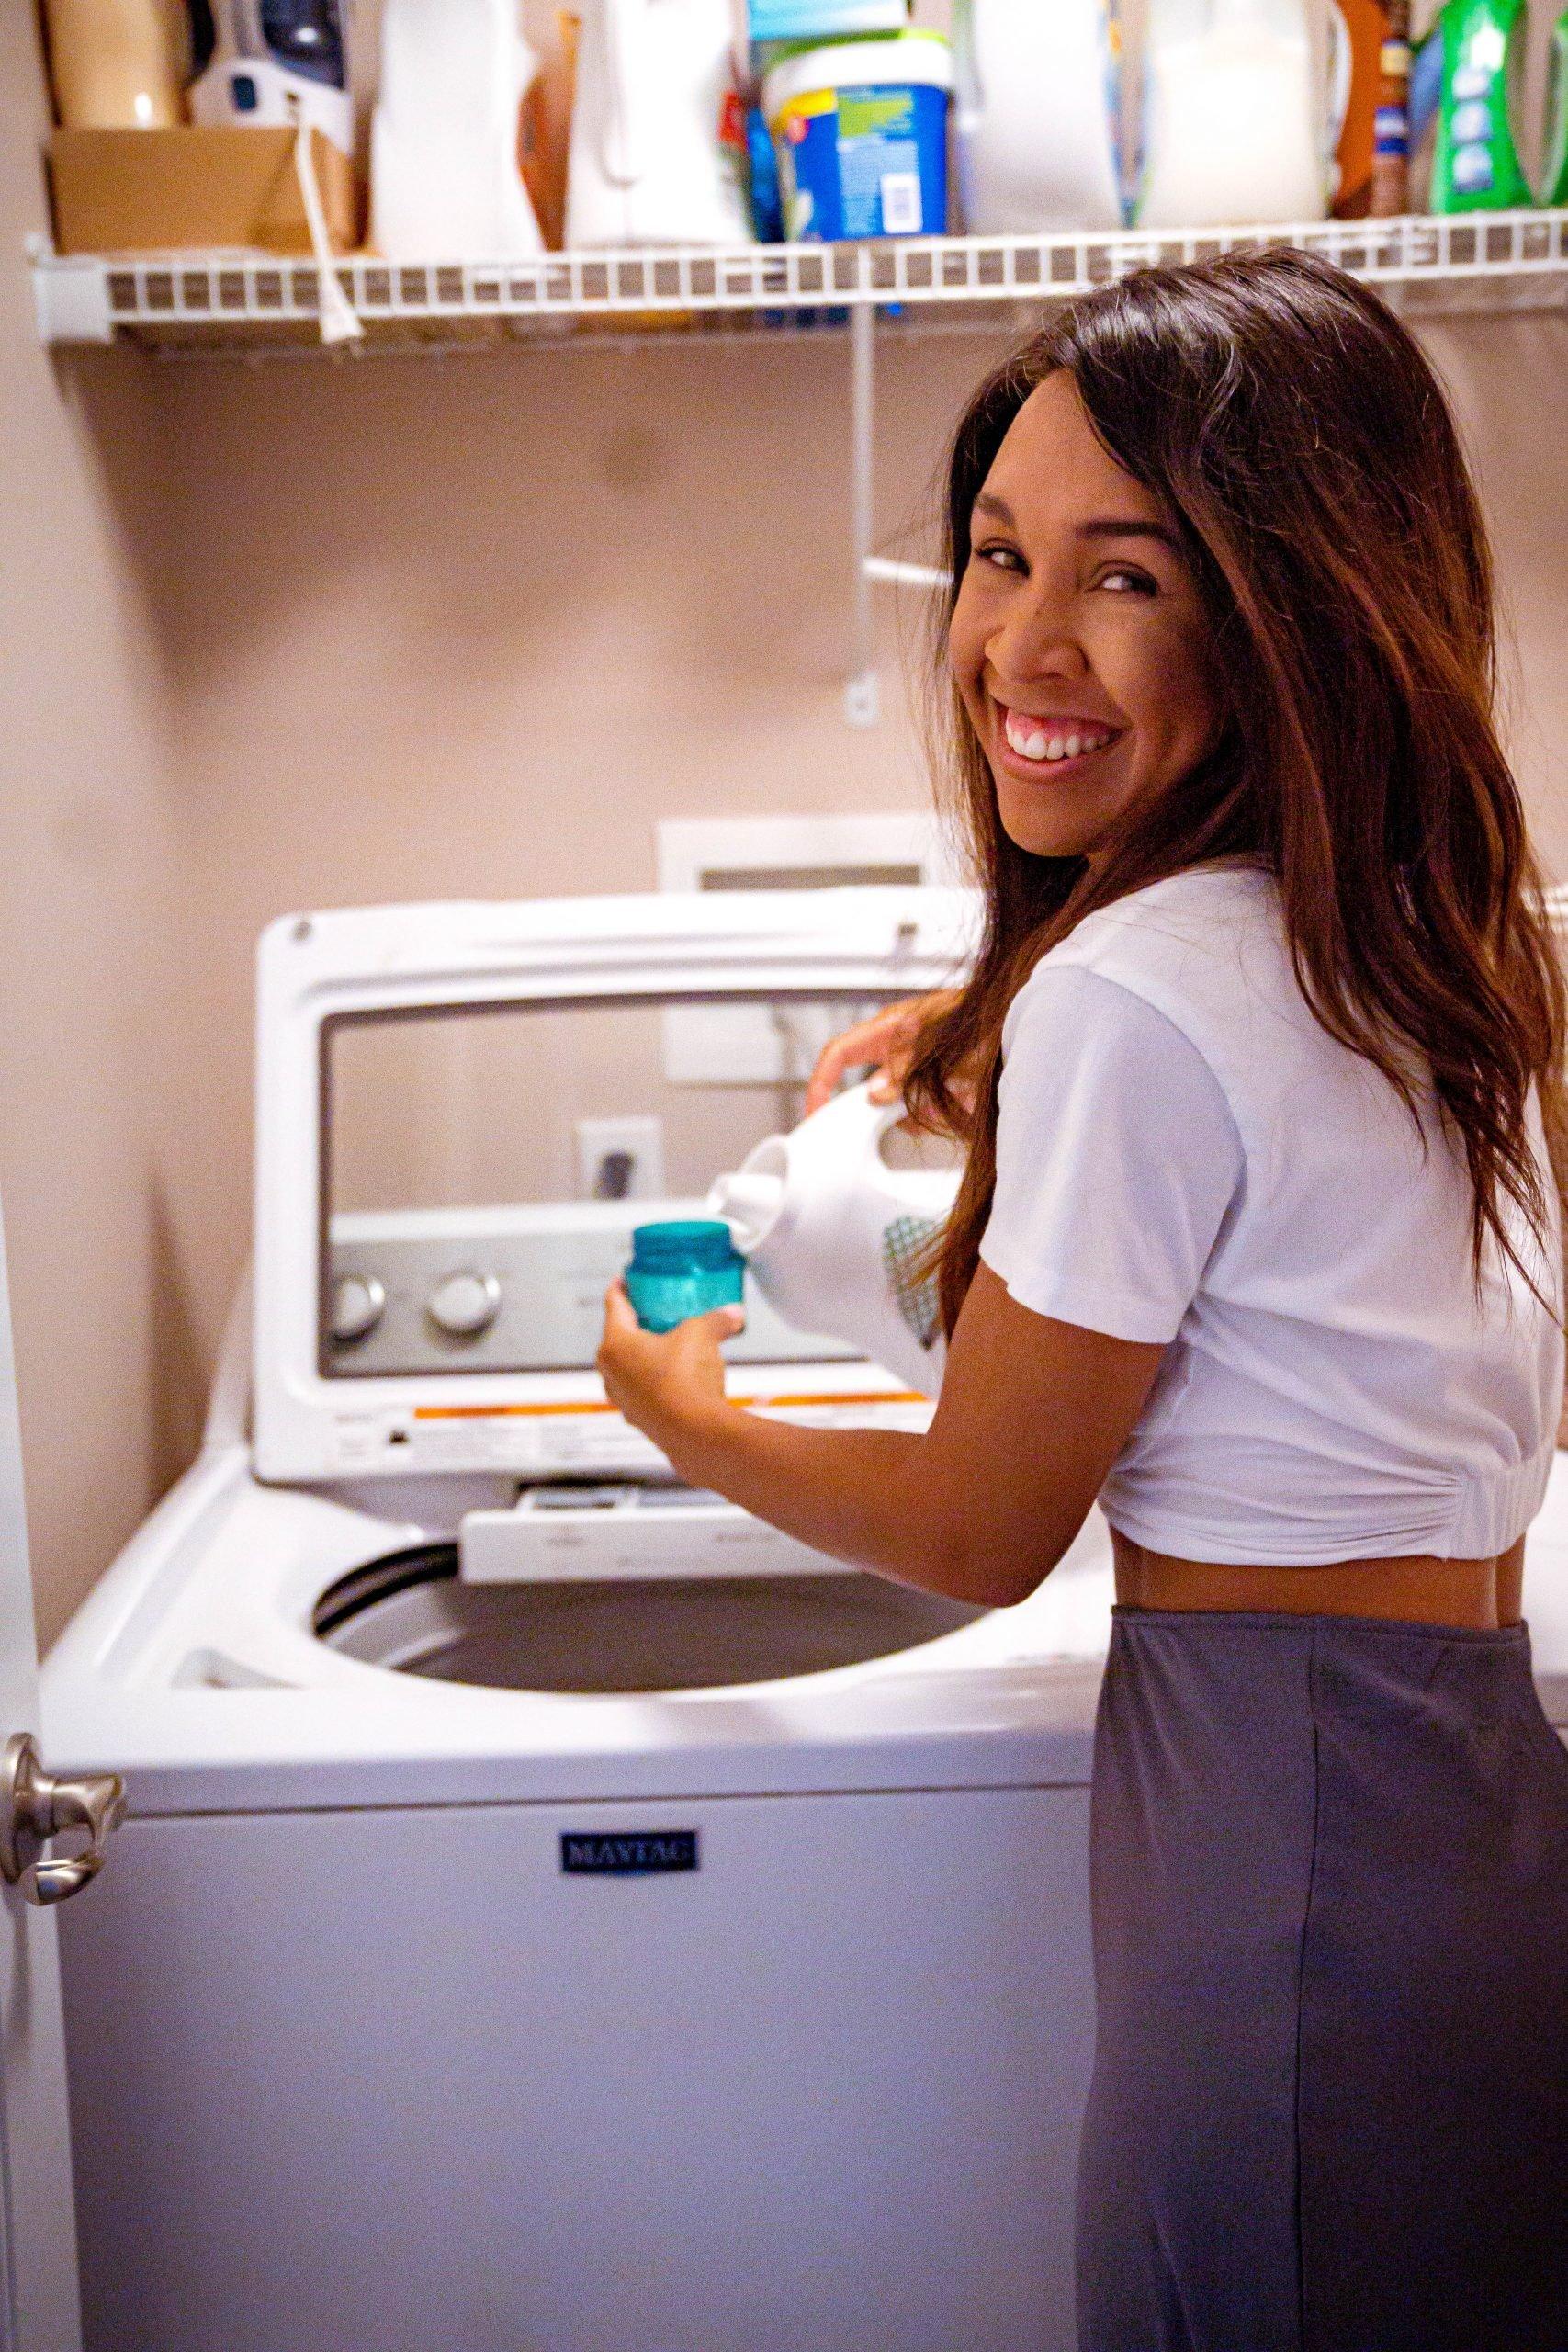 LivingLesh using washing laundry with ivory detergent